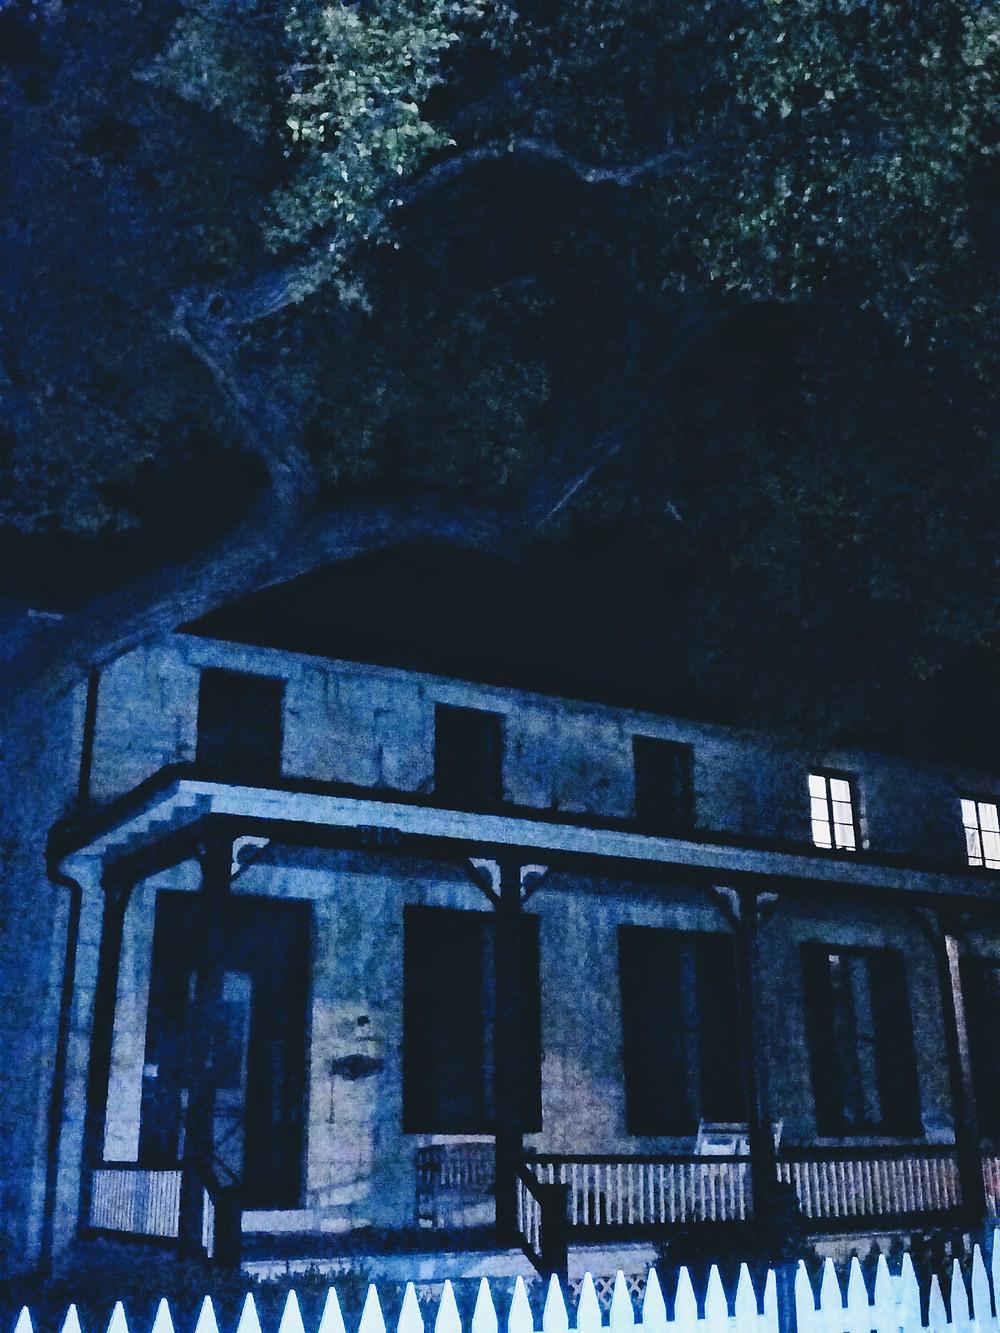 Ft. Riley Kansas Historical Society Ghost Tour sights, main post, Custer House